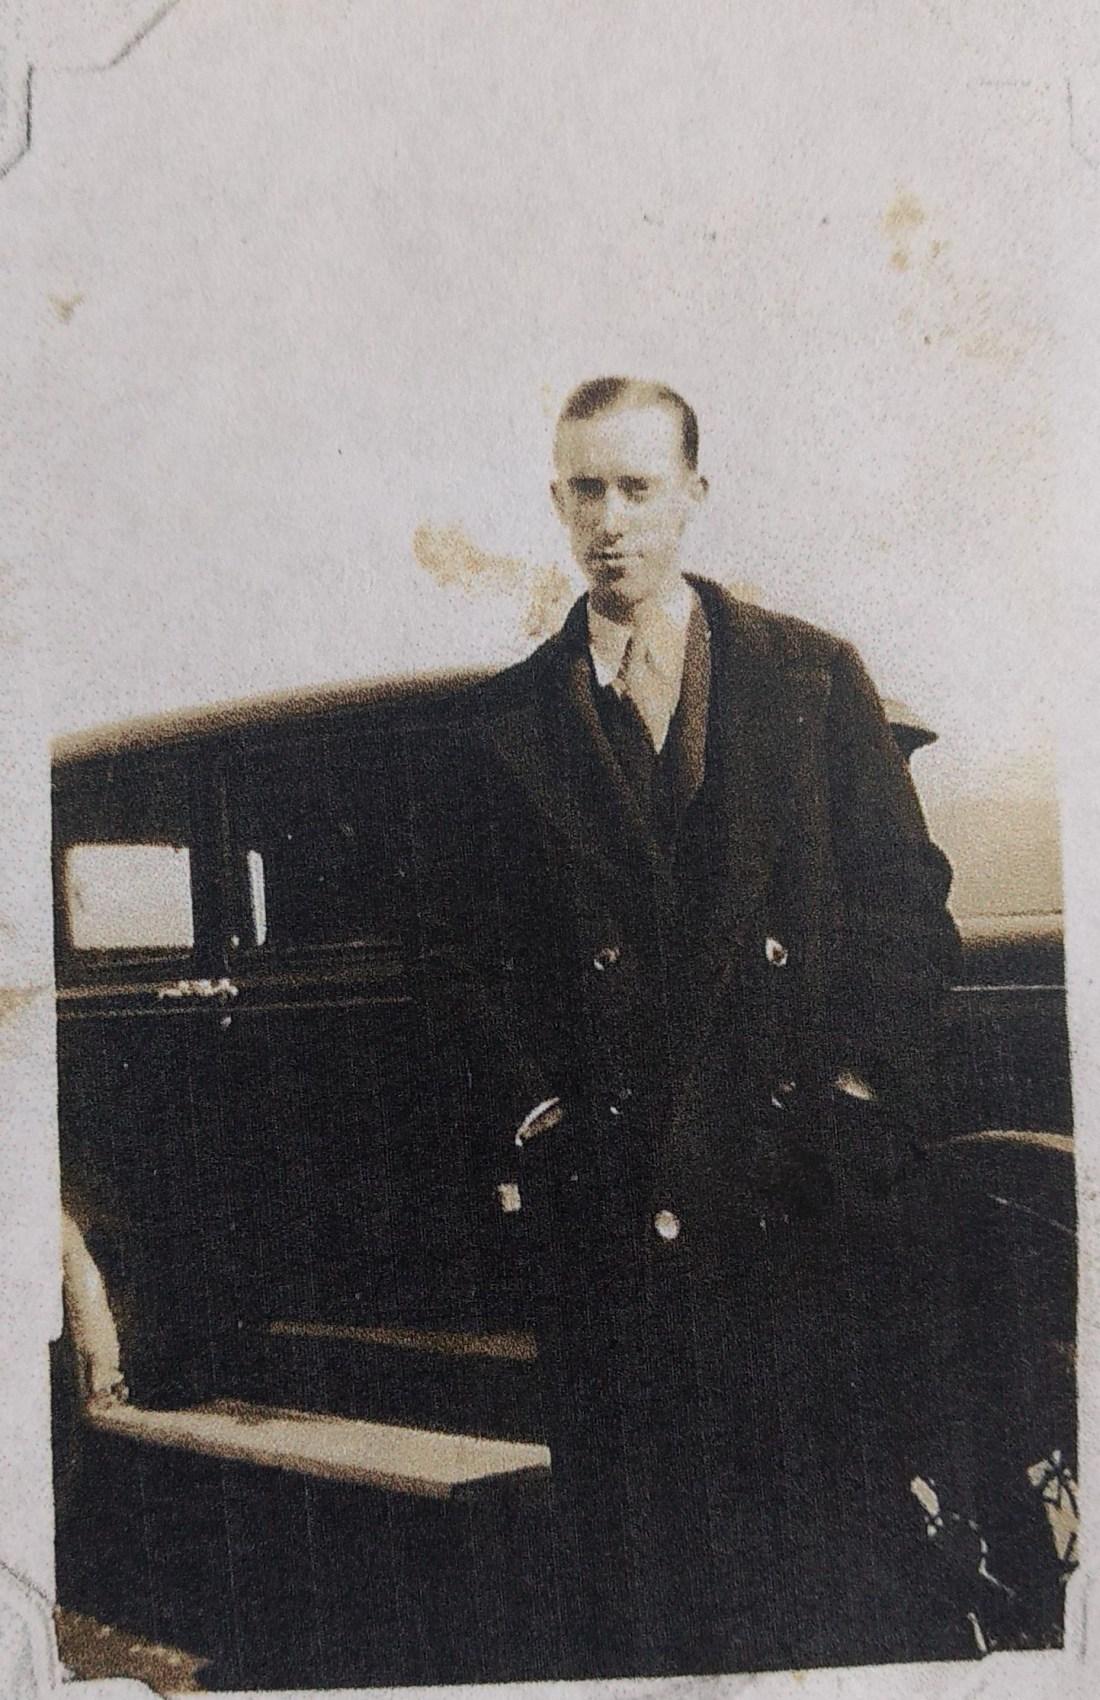 Earl Stone, Principal 1929-1930